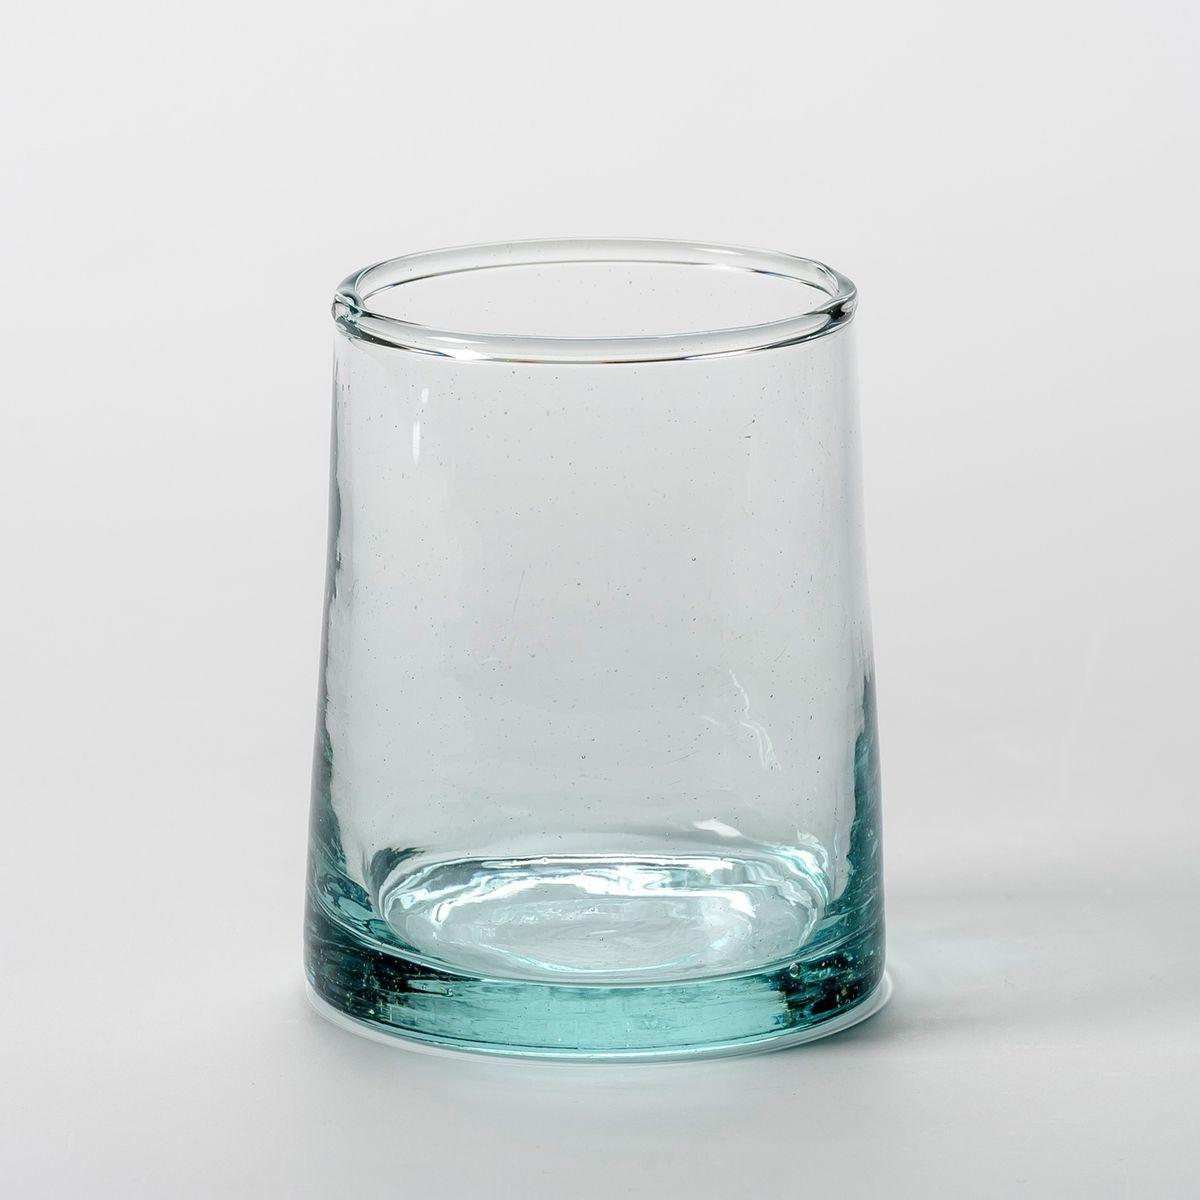 Lot de 6 verres à eau en verre Gimani | Verre recyclé